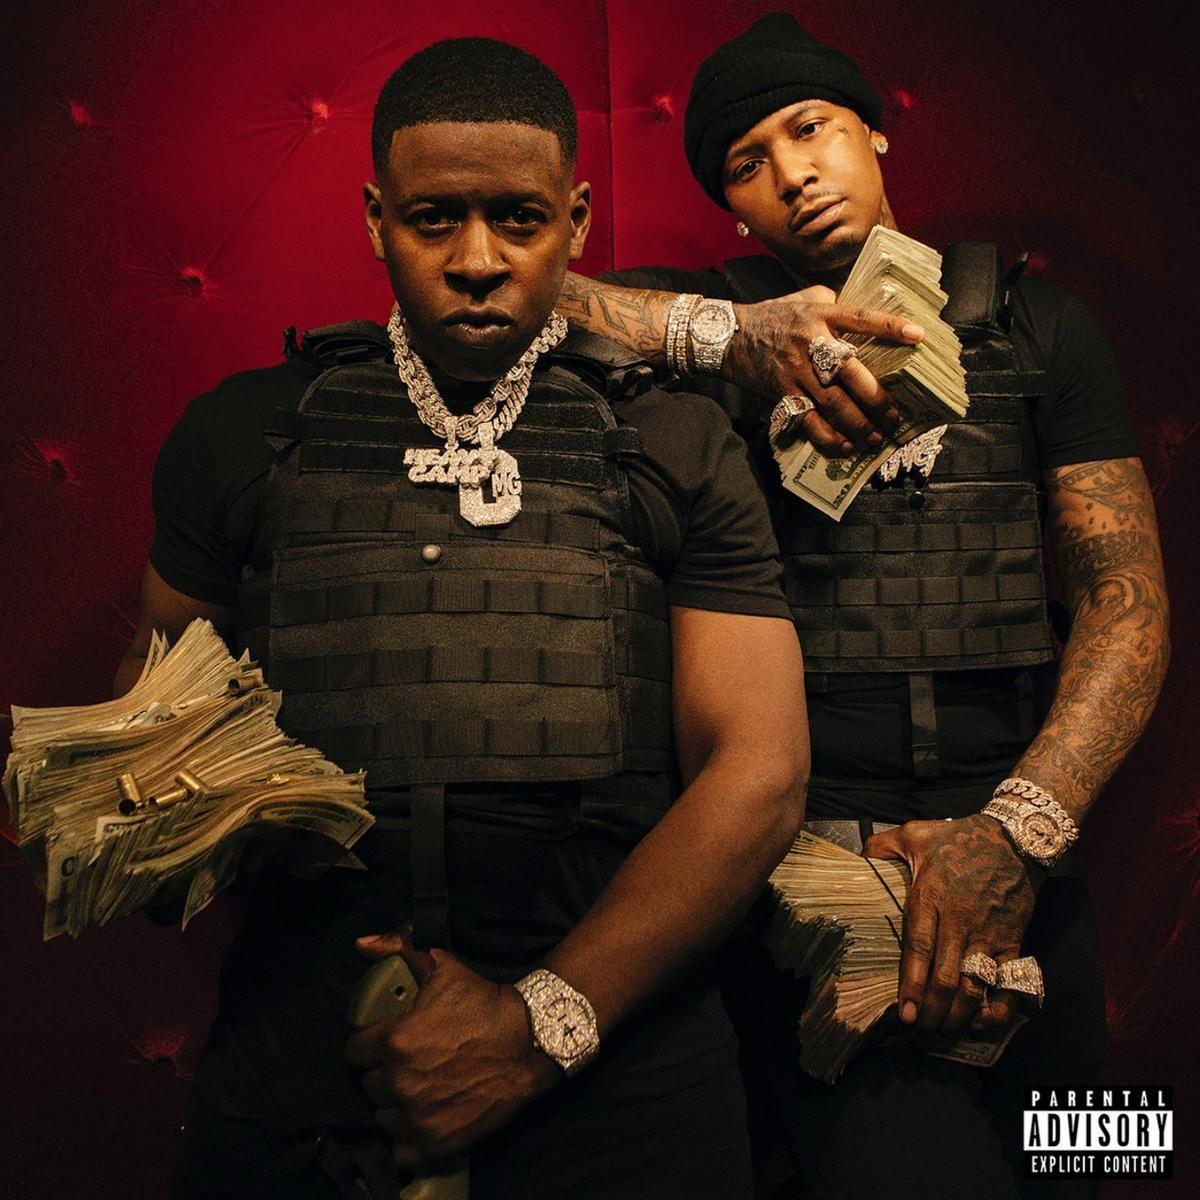 Demons Moneybagg Yo Feat Blac Youngsta Https Wavwax Com Demons Moneybagg Yo Feat Blac Youngsta Rap Albums Popular Music Videos Hip Hop New